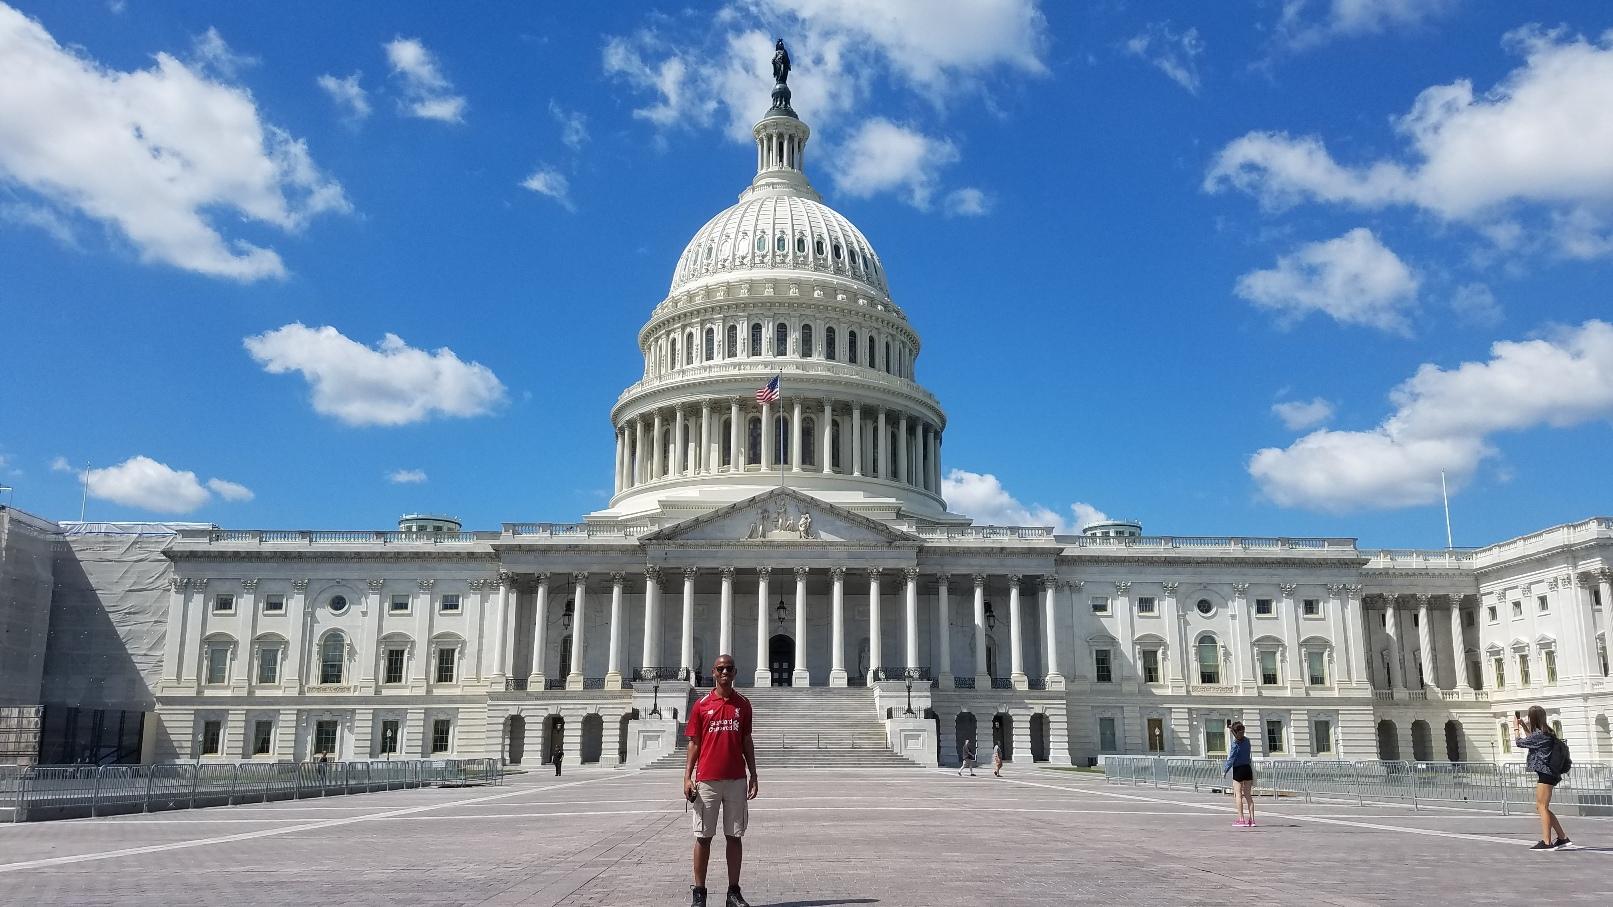 U.S. Capitol building dome in Washington DC